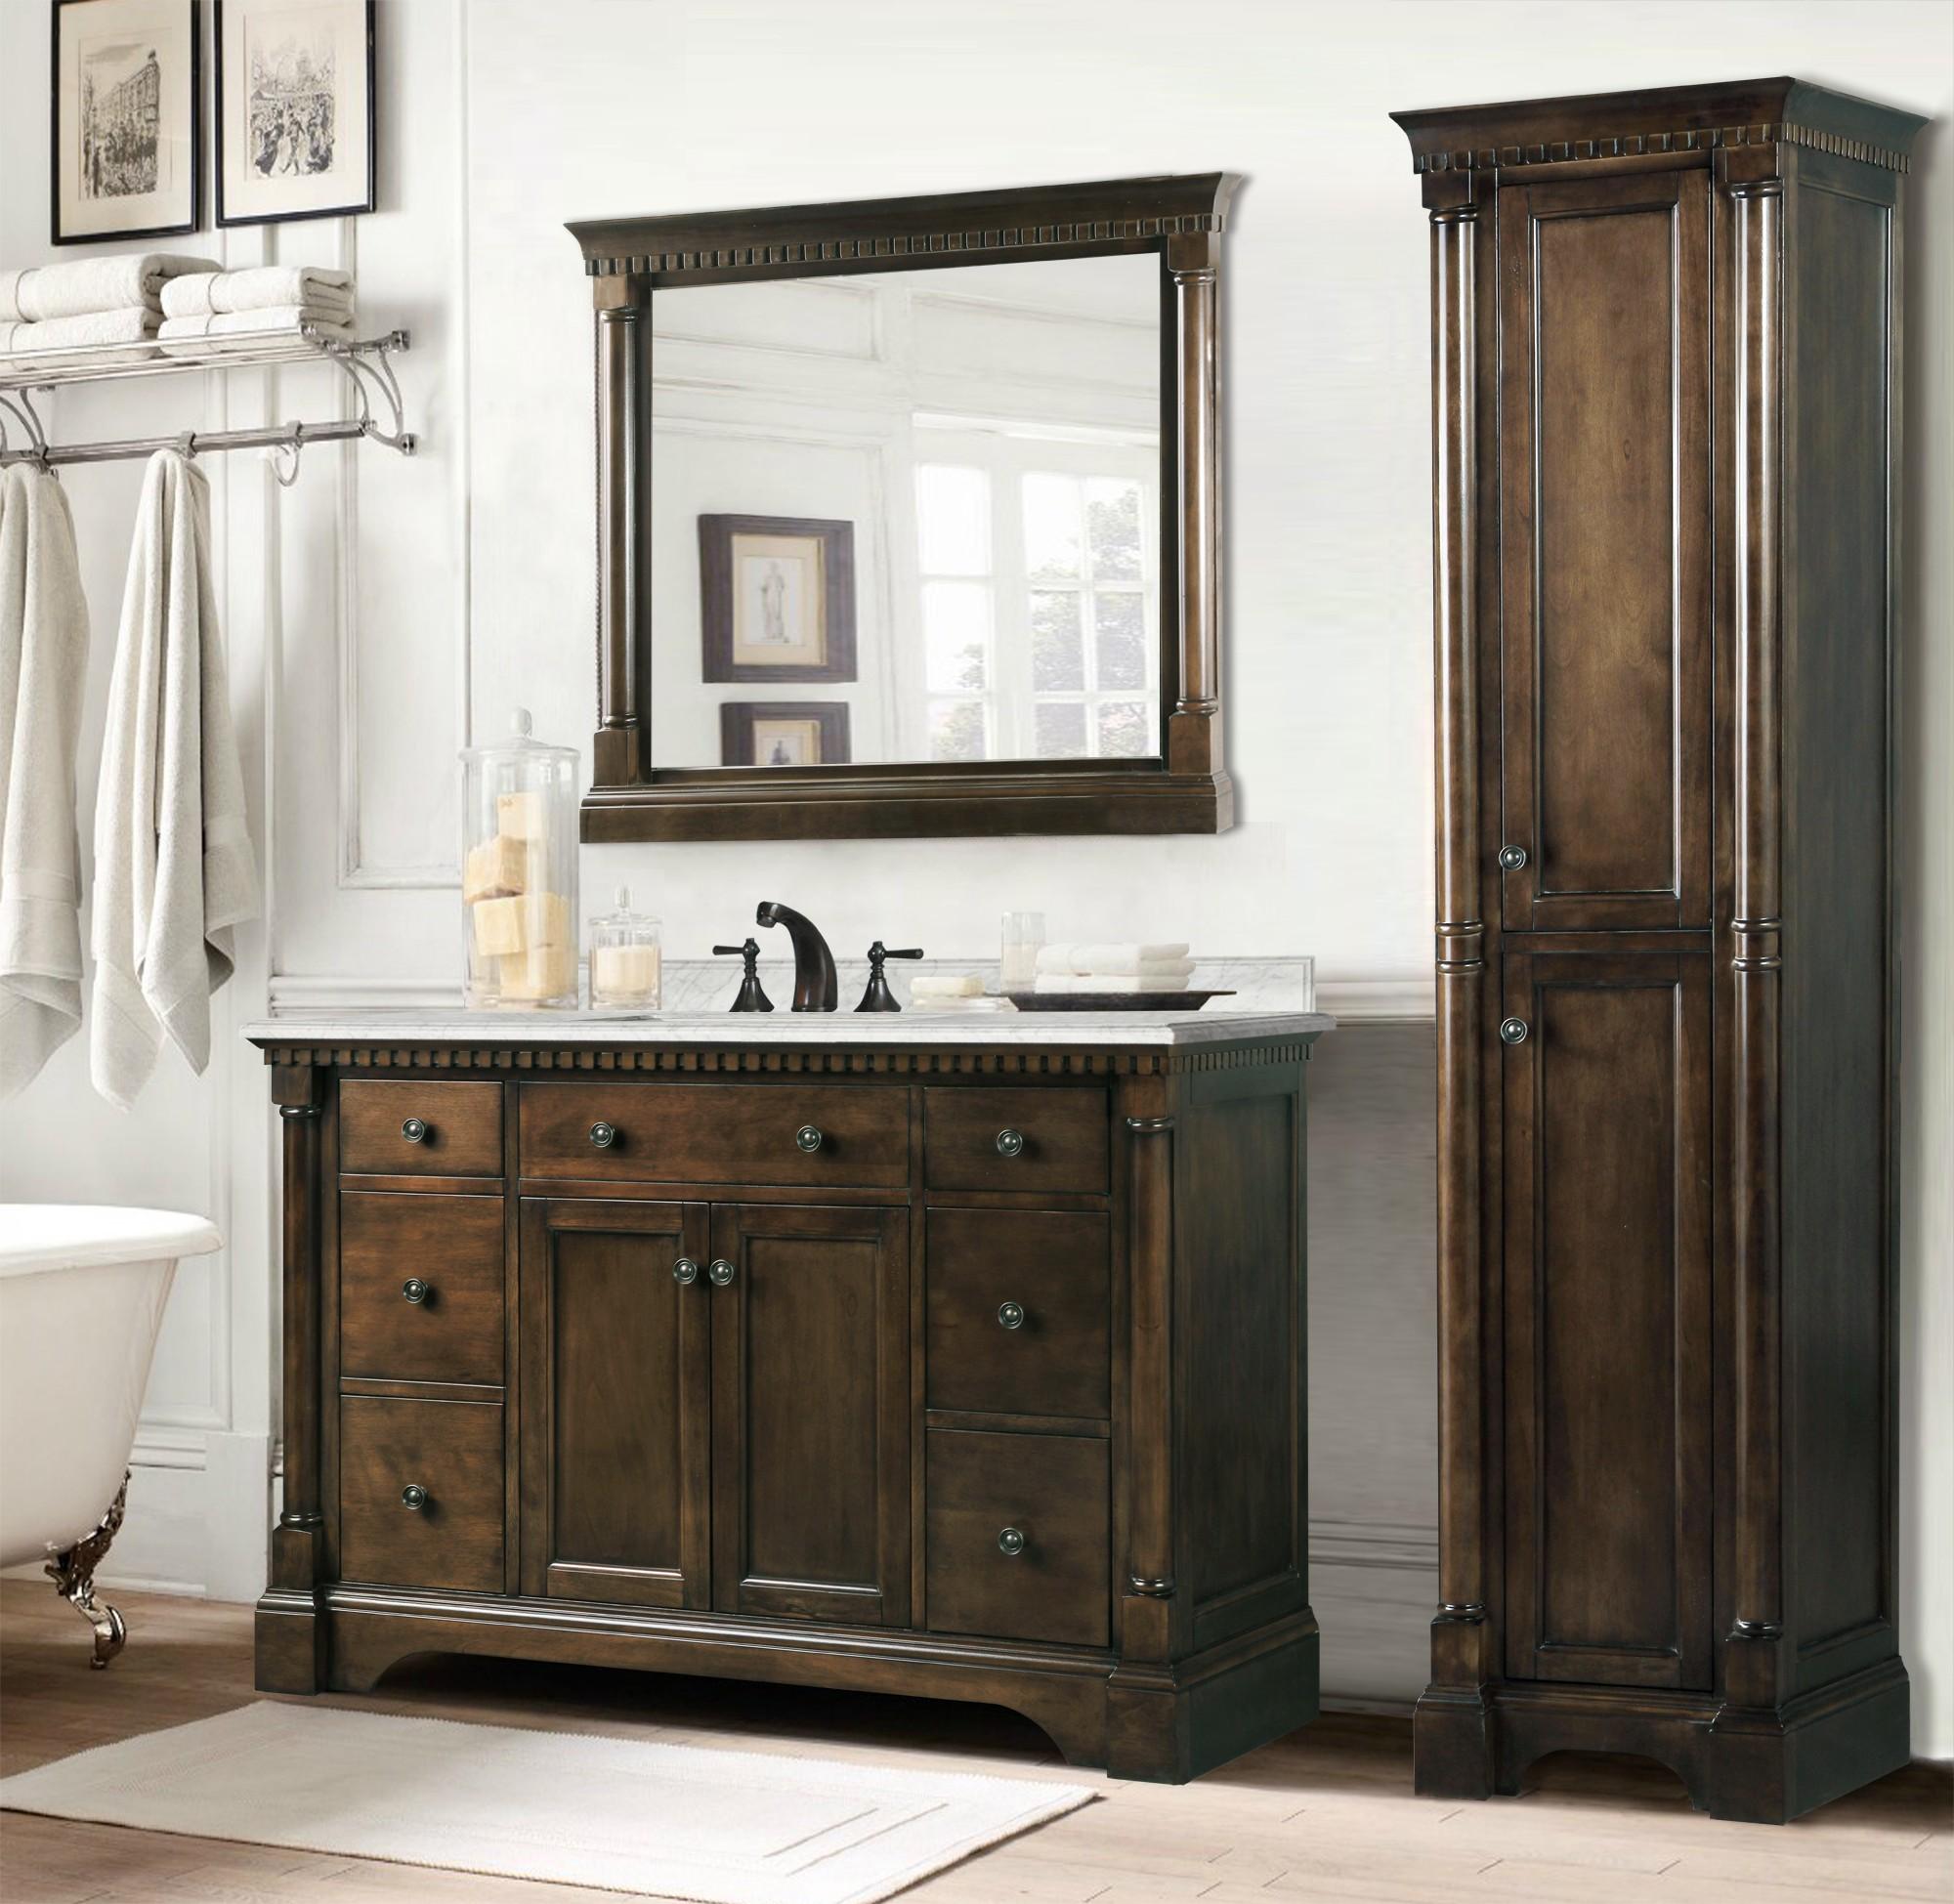 Top Bathroom Vanities Clearance Photo - Home Sweet Home ...